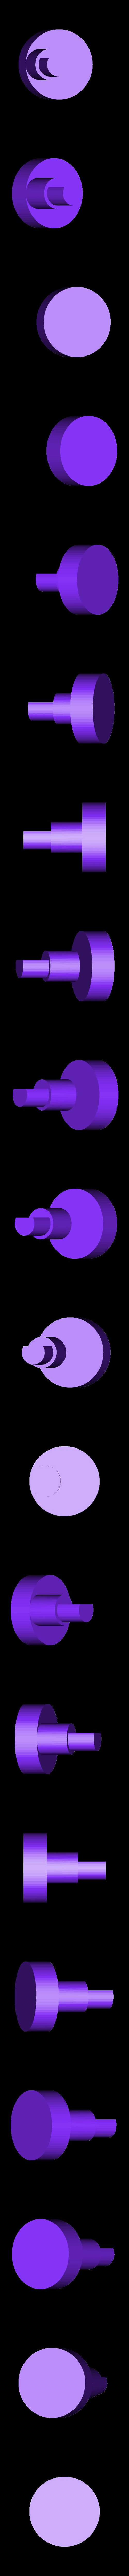 Crank1.stl Télécharger fichier STL gratuit Châssis du robot Walker • Design à imprimer en 3D, SiberK